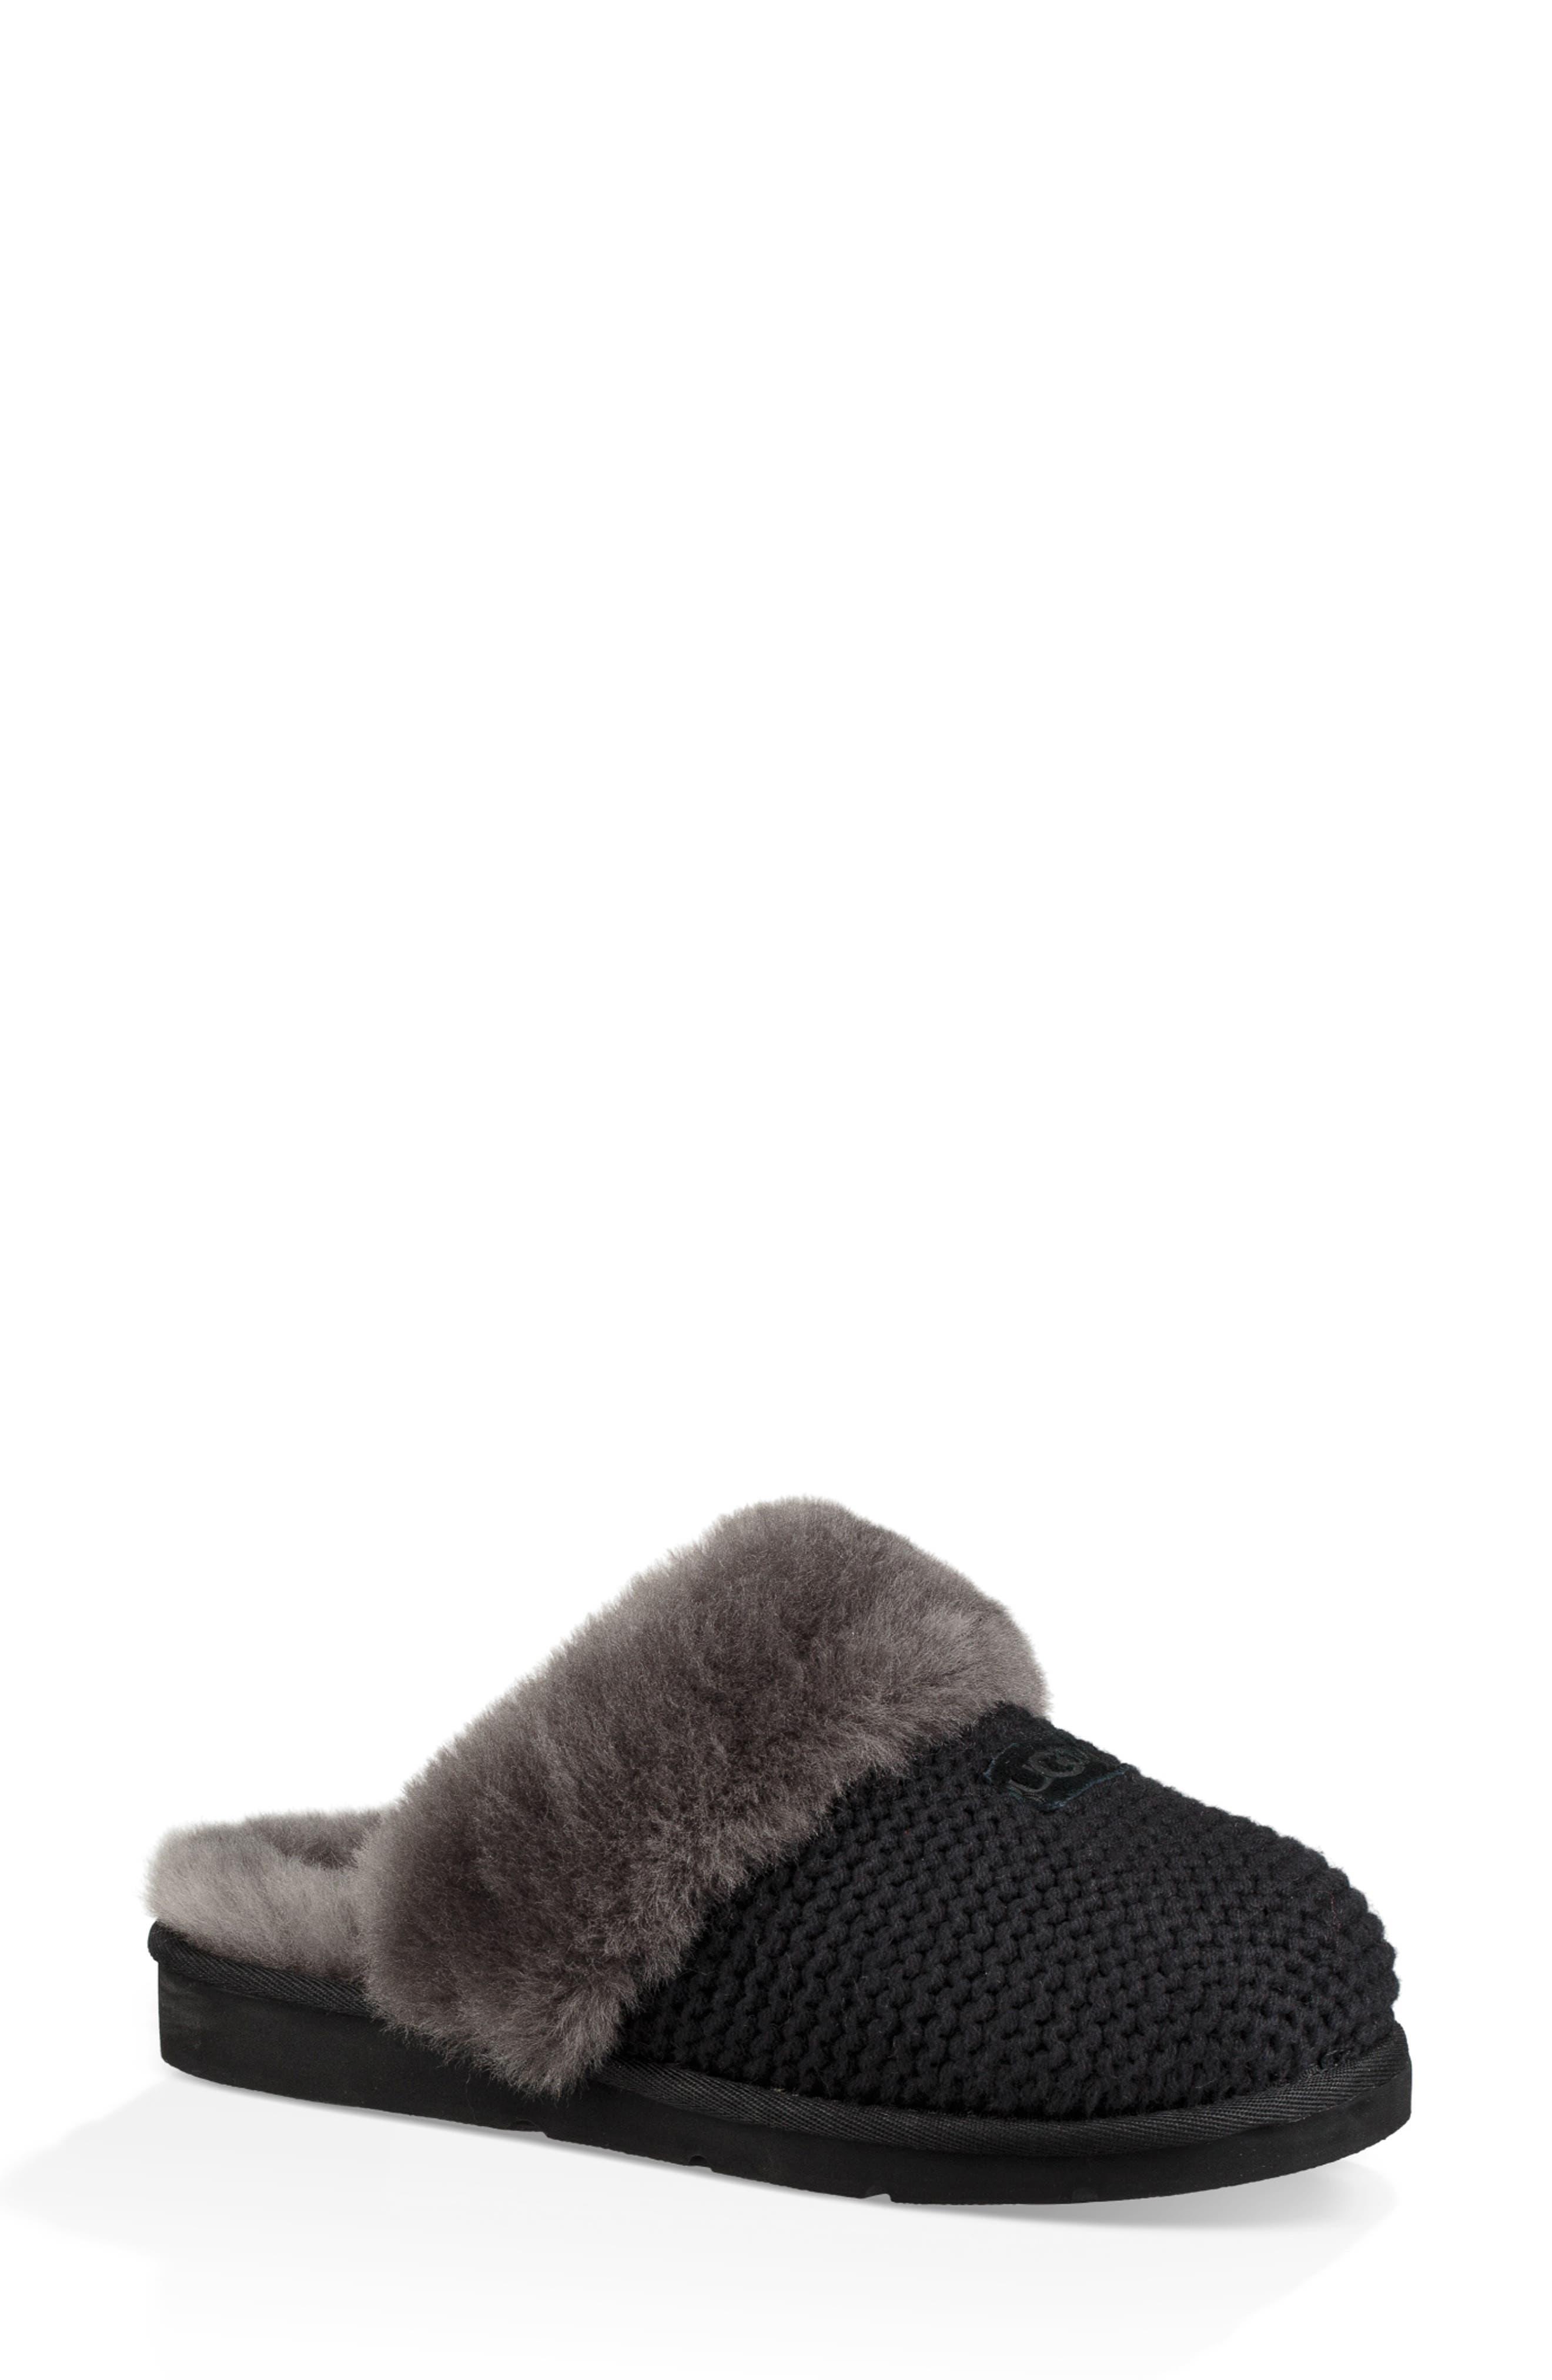 Ugg Cozy Knit Genuine Shearling Slipper, Black